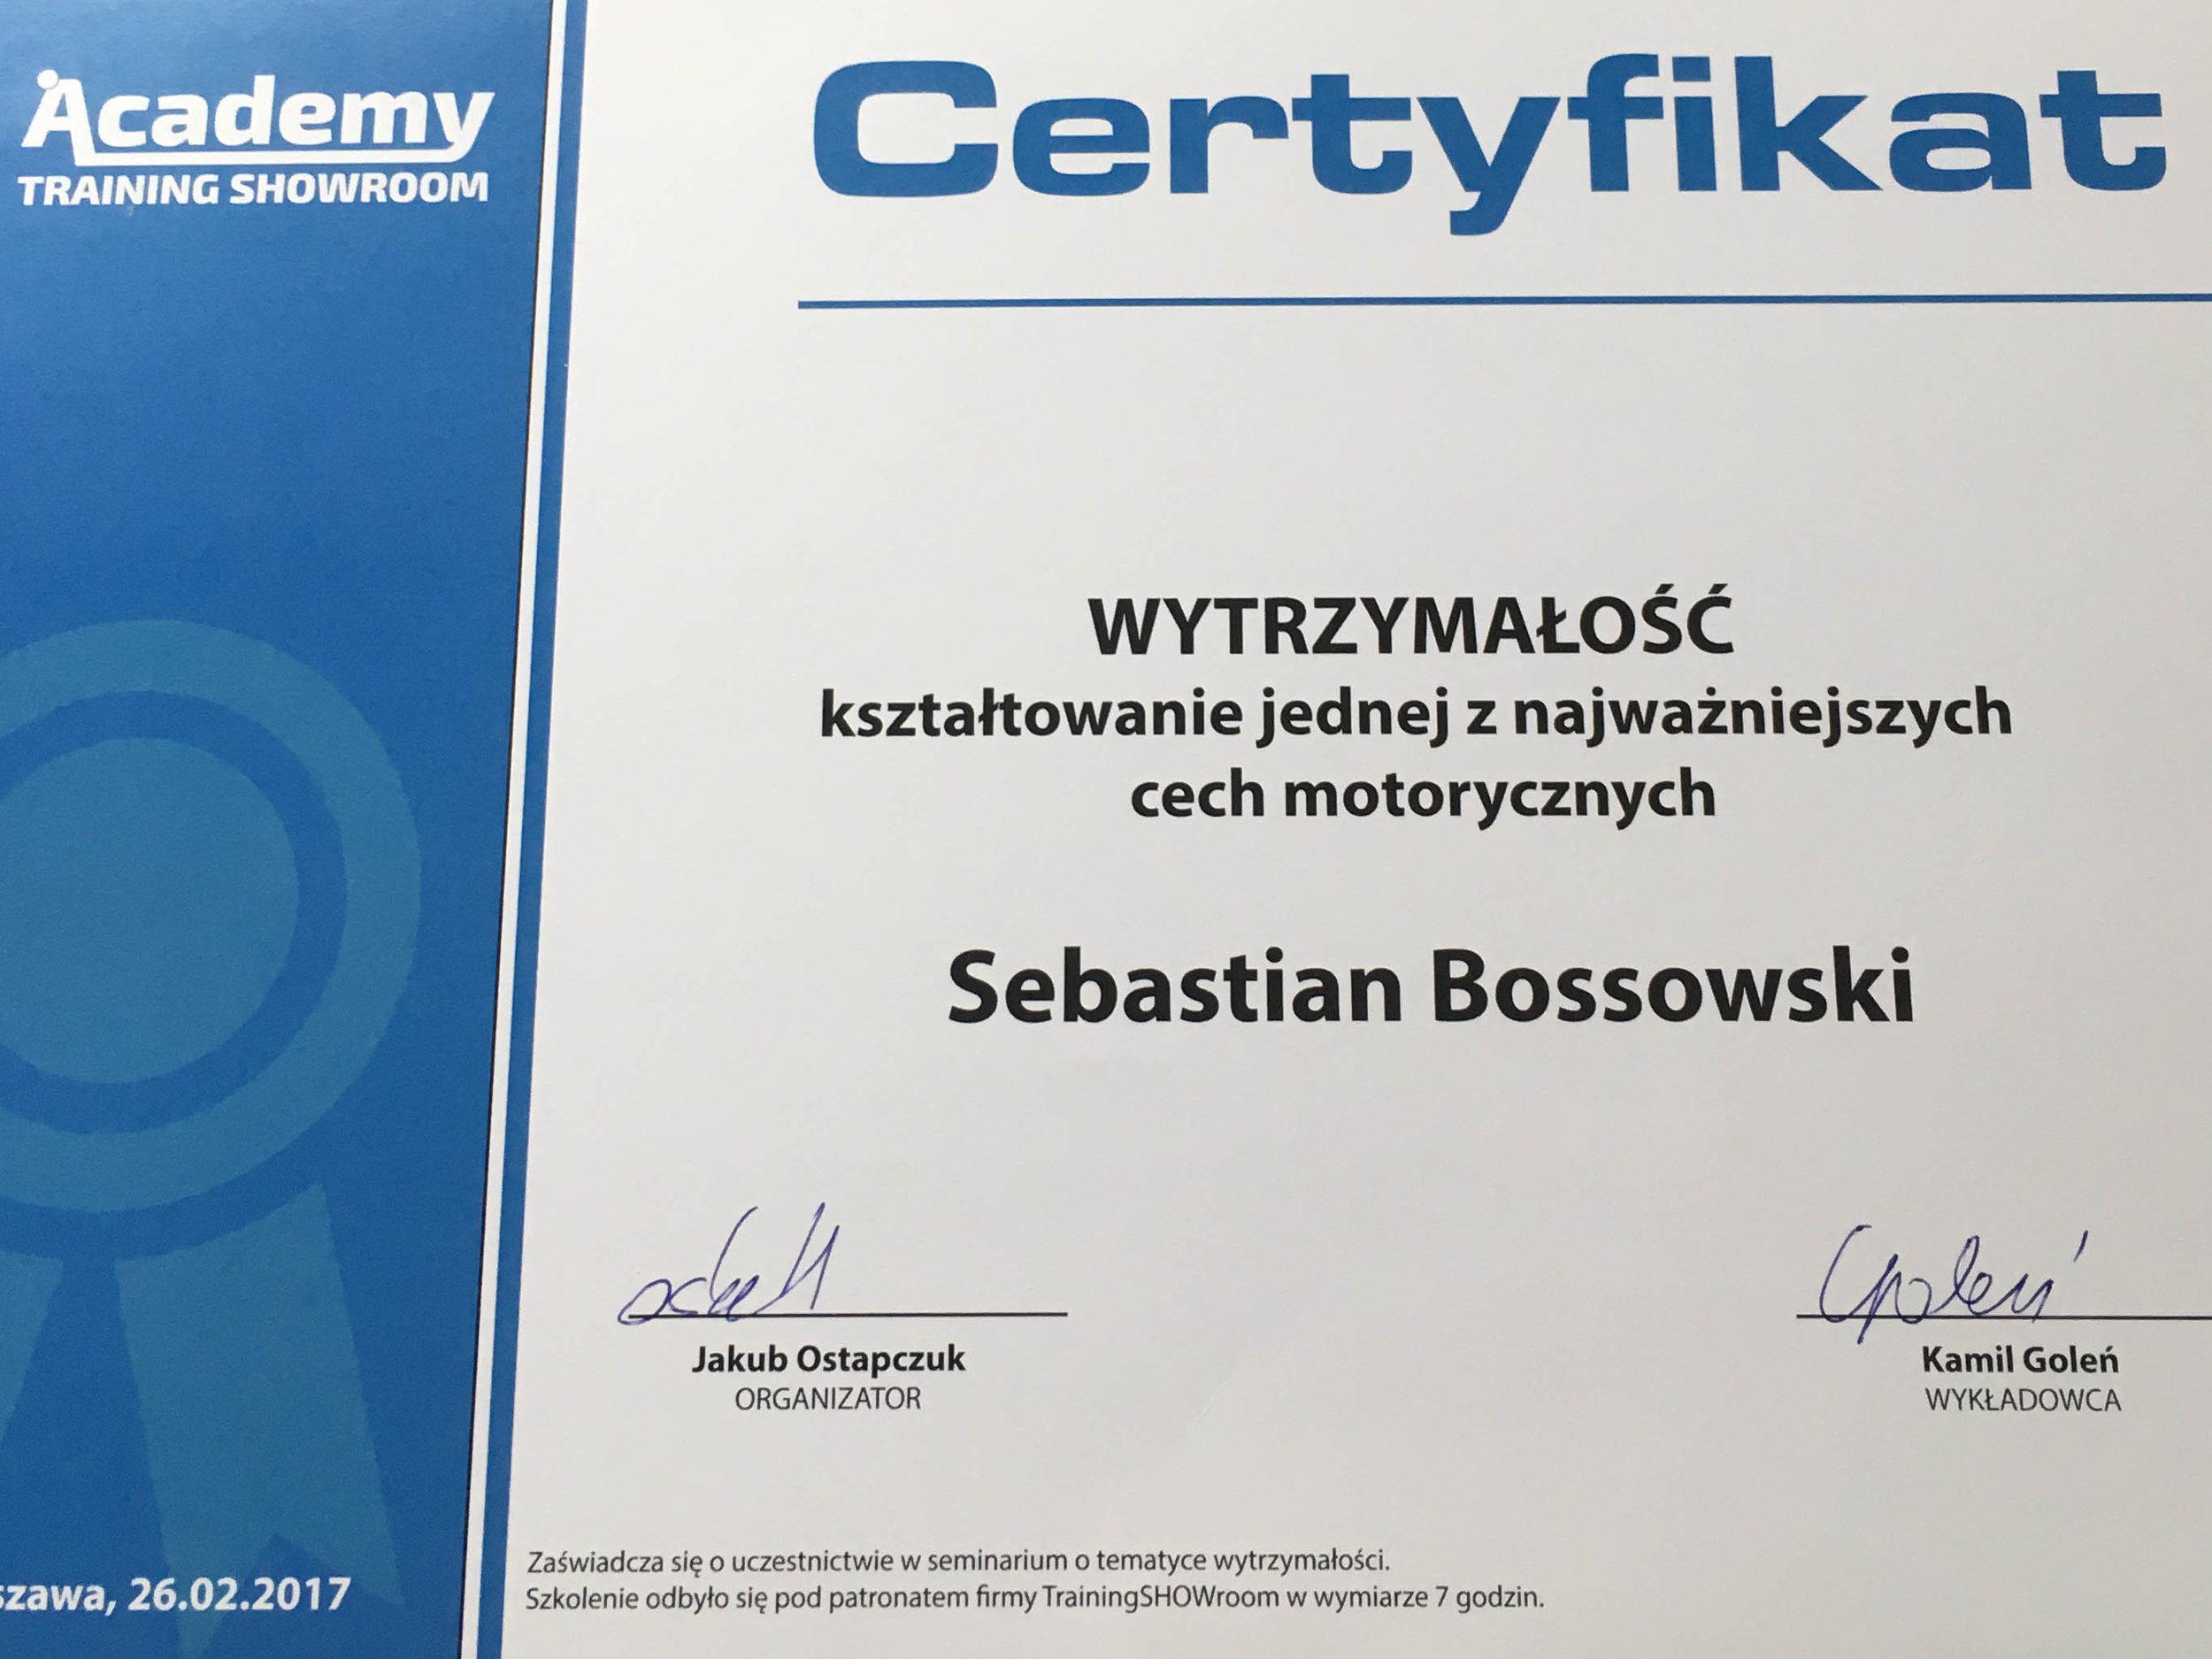 Sebastian Bossowski certyfikat 4.jpg